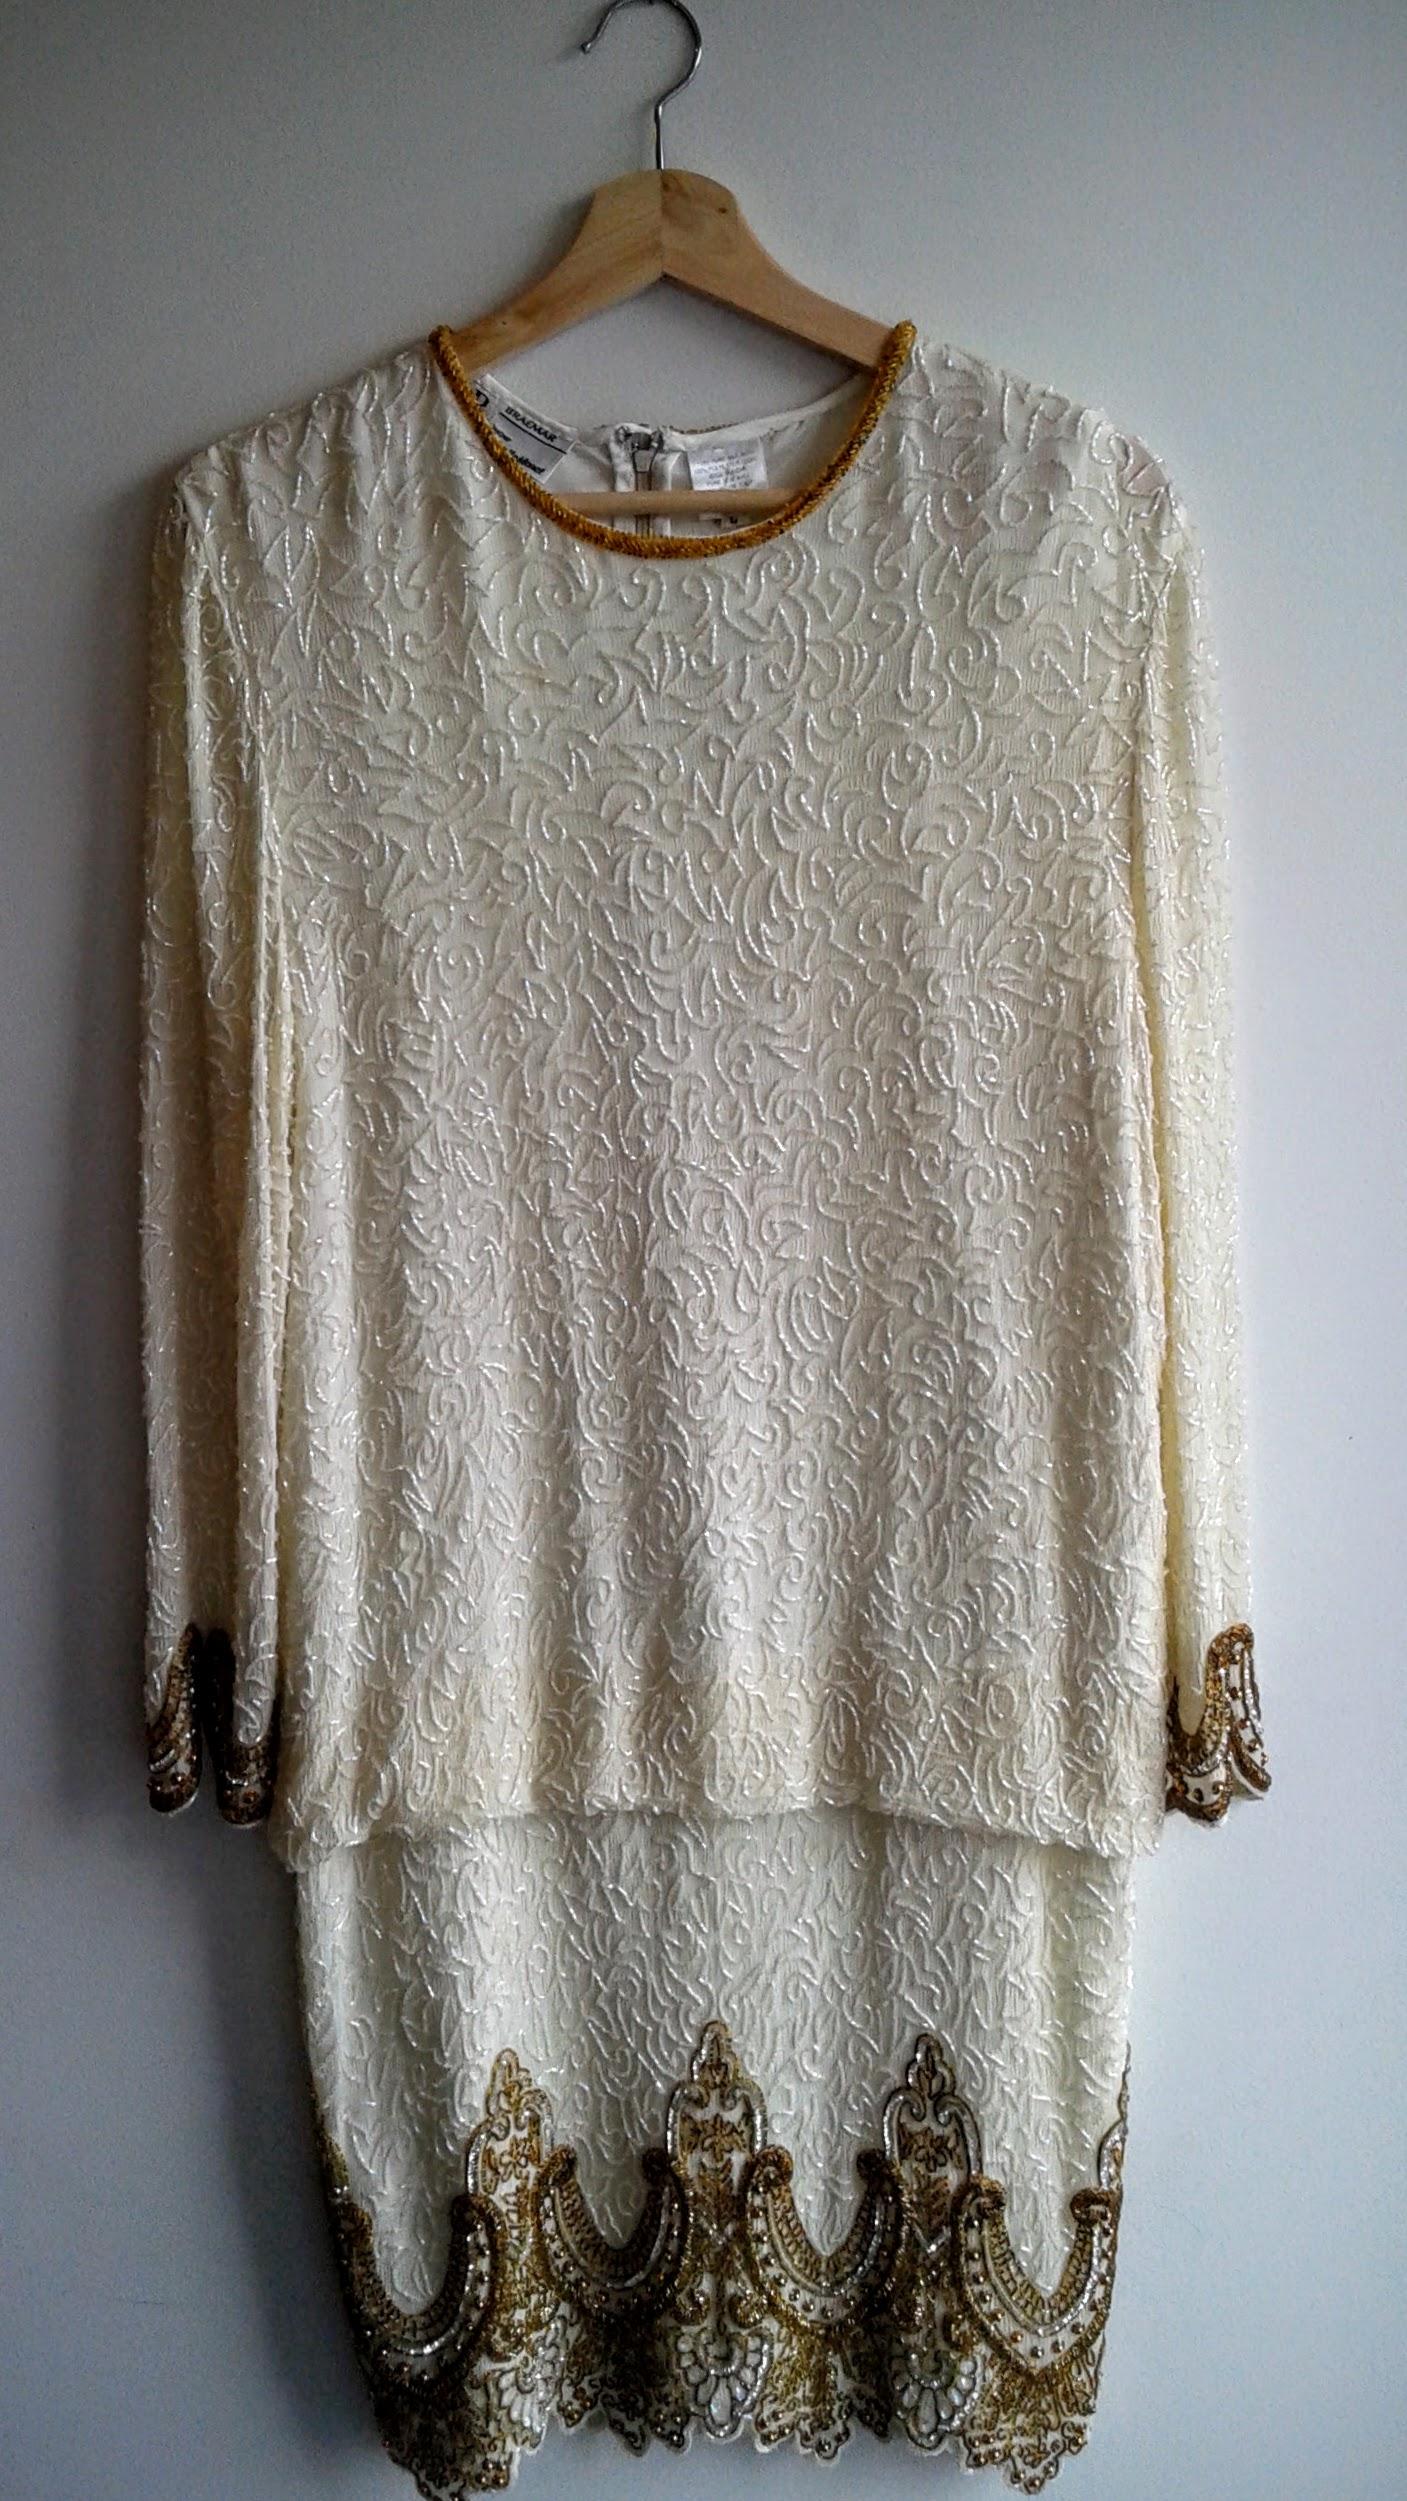 Vintage beaded dress; Size L $95